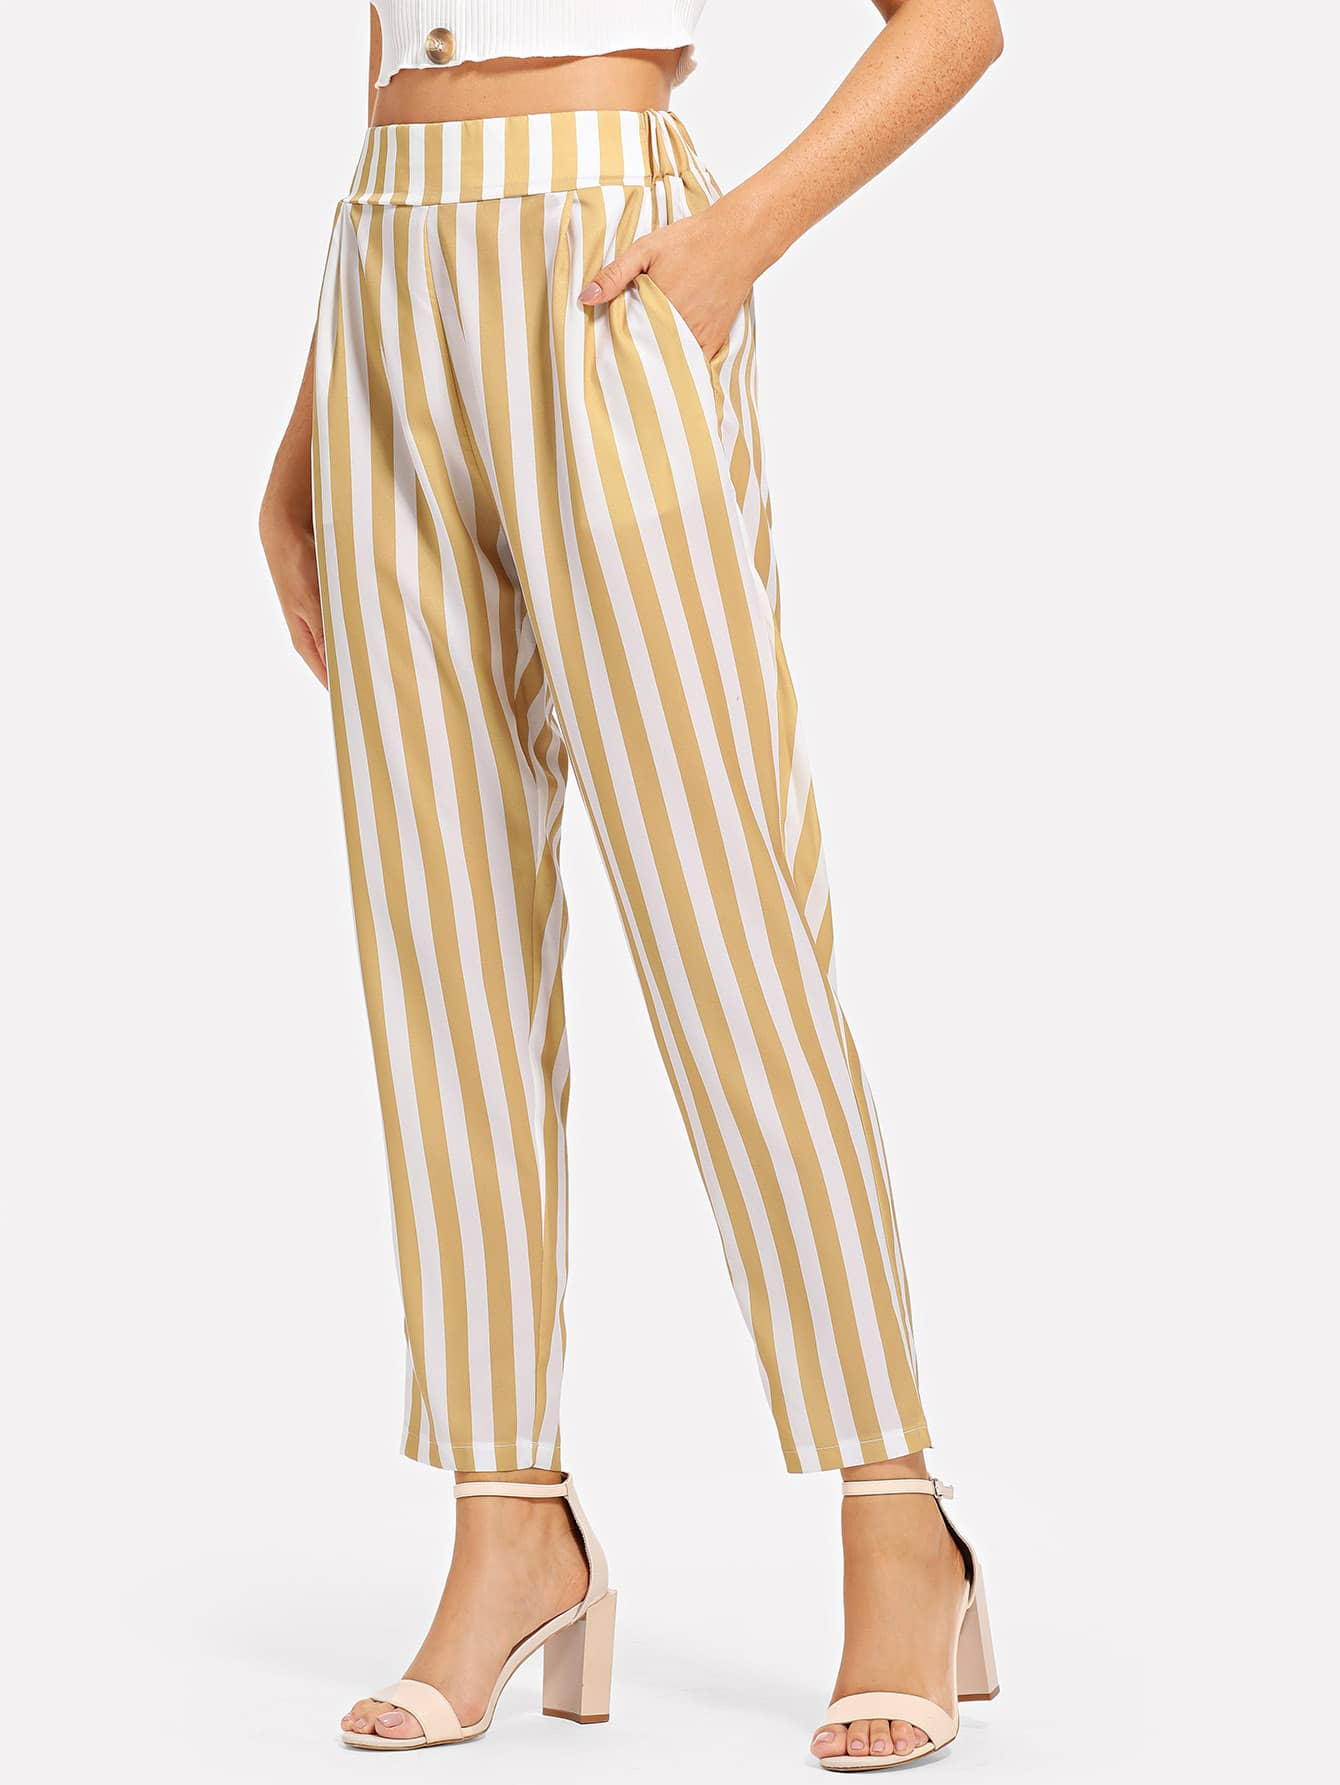 e680f9a90f6 Pocket Side Elastic Waist Striped Pants EmmaCloth-Women Fast ...